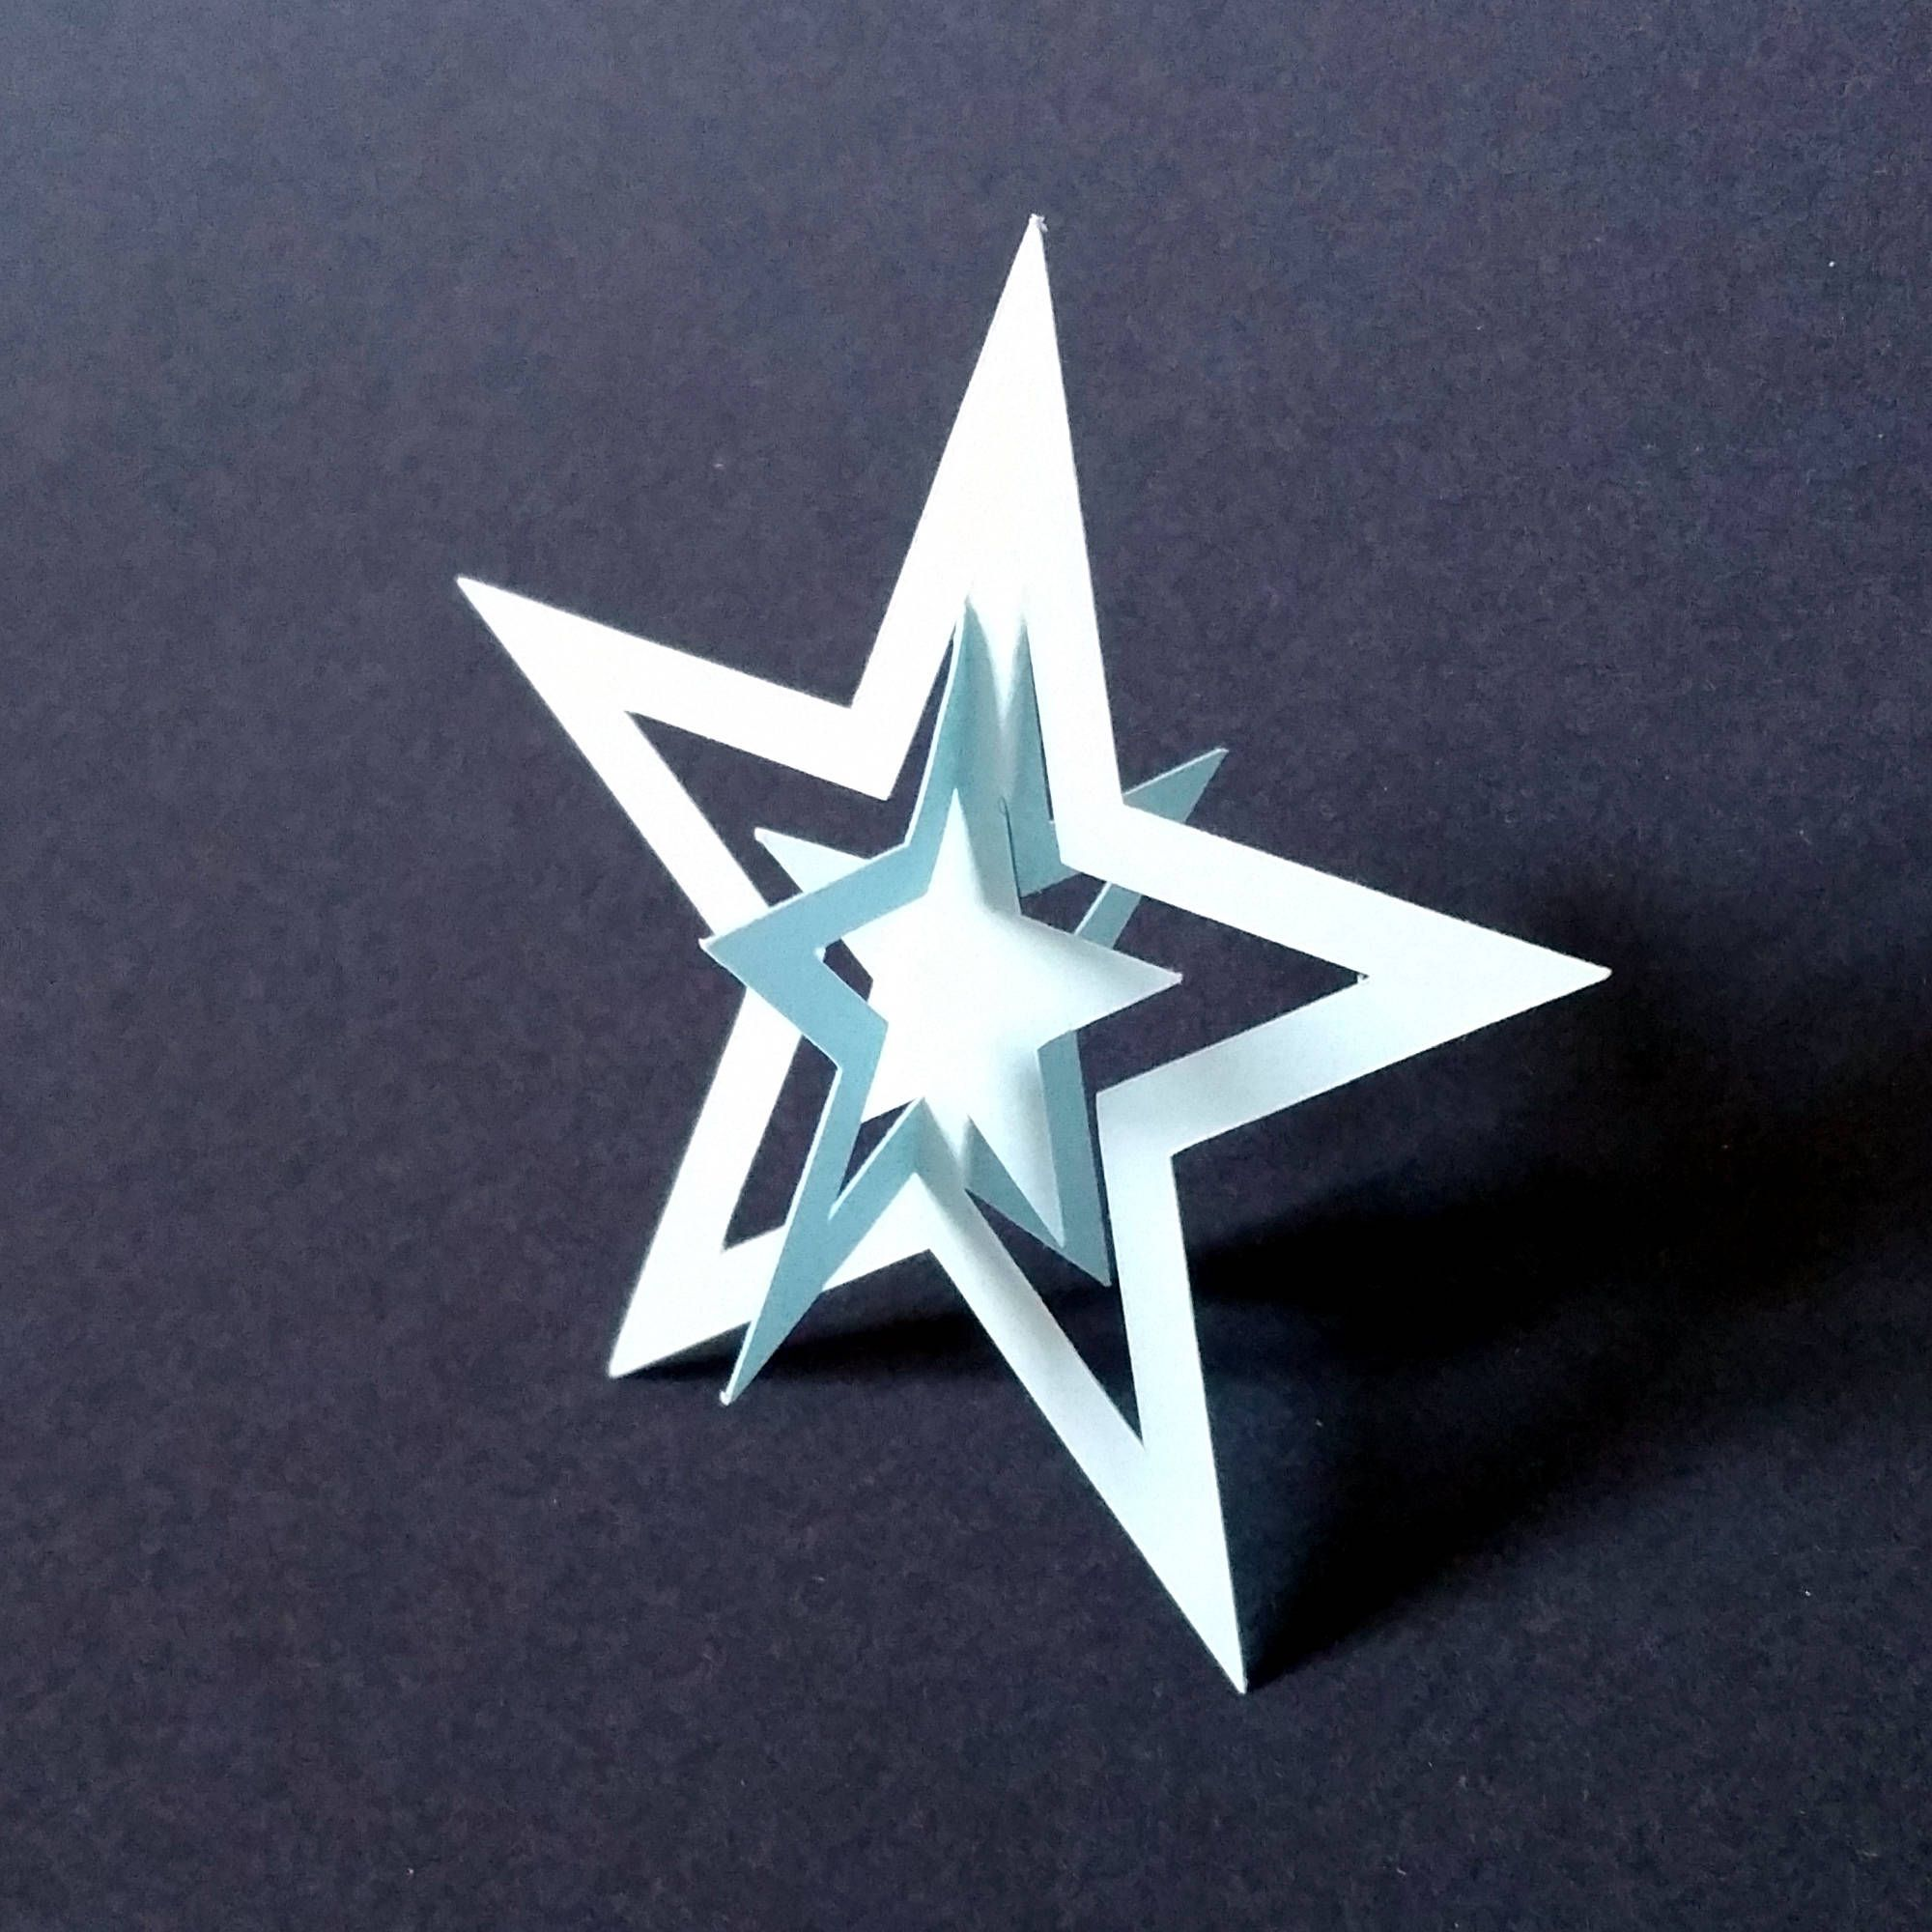 Printable Star Pattern For Pdf Download Enlarge 150 For Full